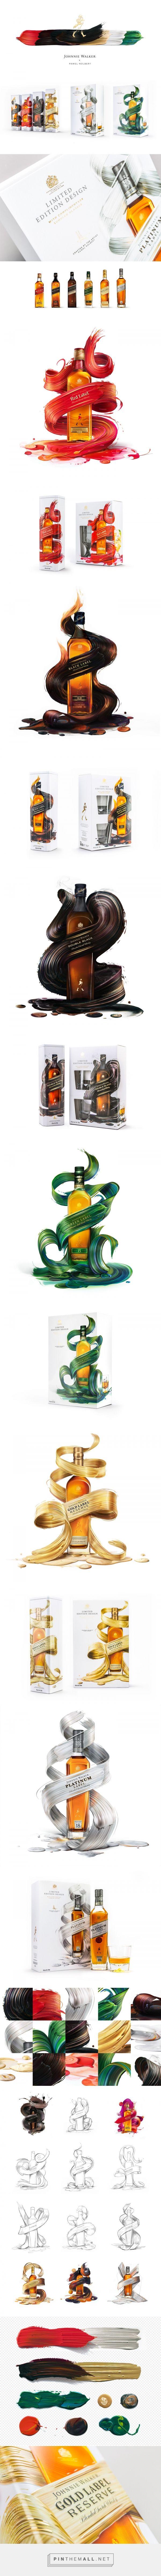 Johnnie Walker x Pawel Nolbert Limited Artist Edition - http://www.packagingoftheworld.com/2017/01/johnnie-walker-x-pawel-nolbert-limited.html